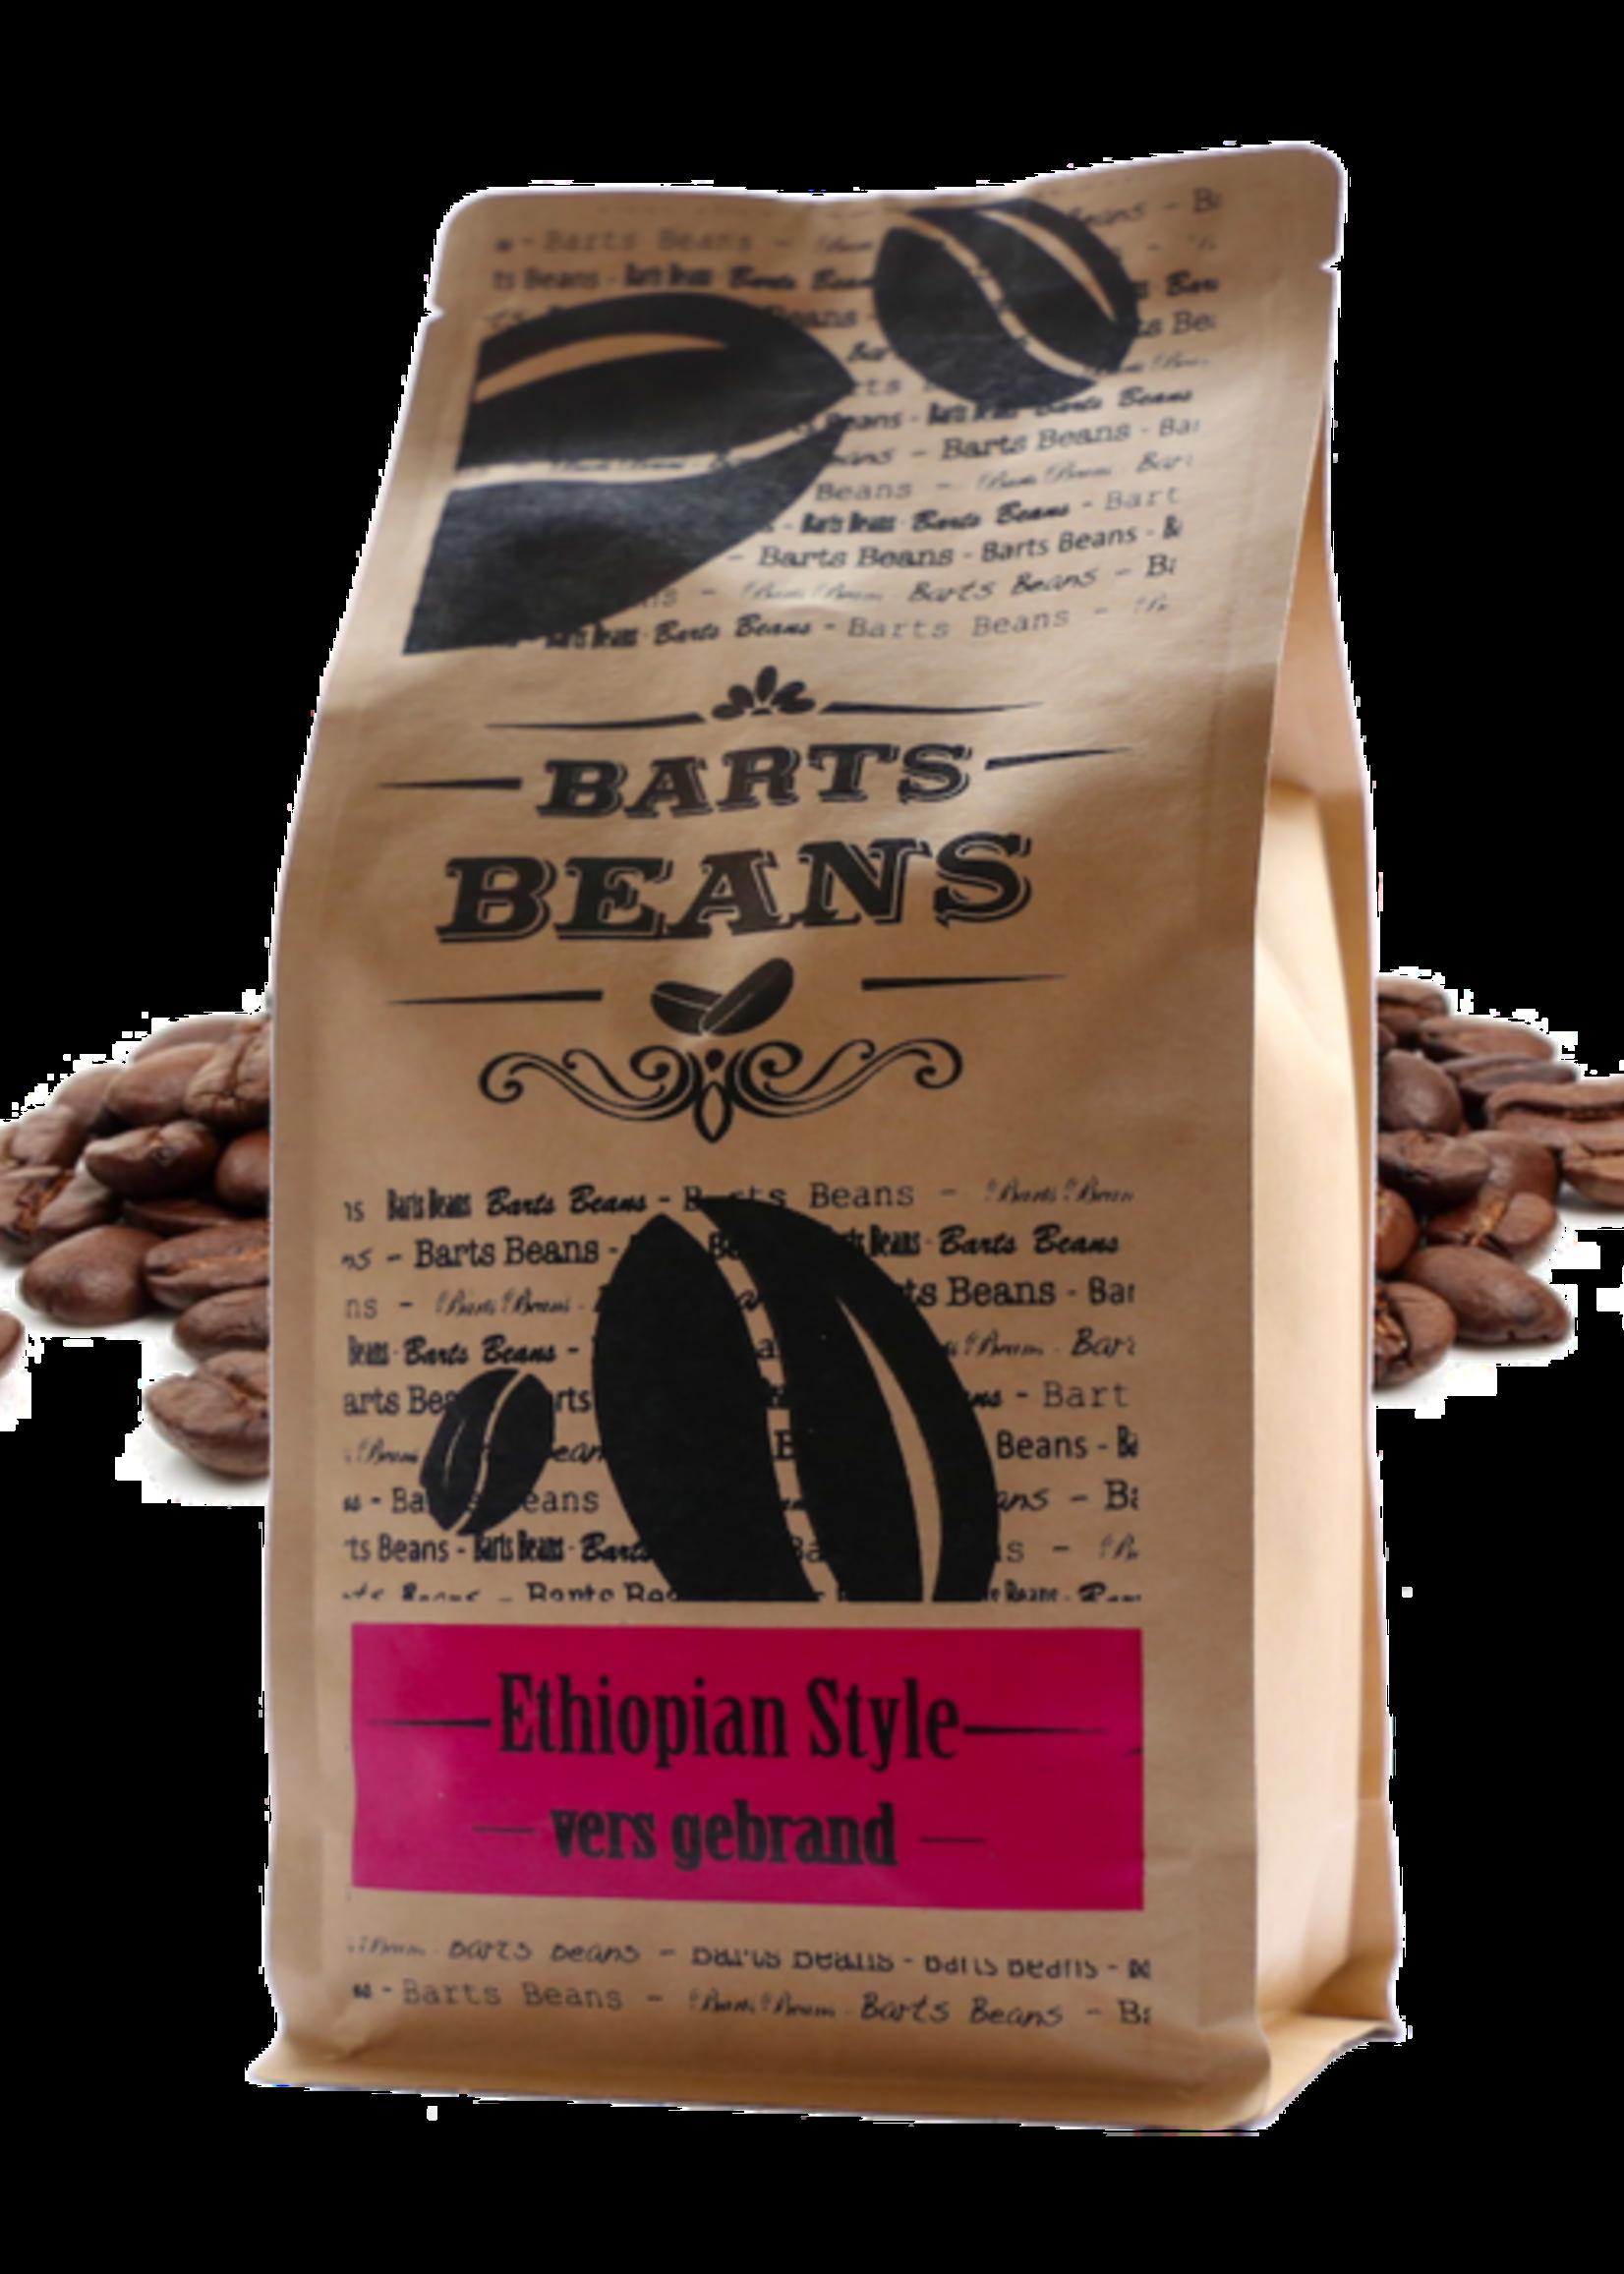 Bart's Beans Bart's Beans - Koffiebonen - Ethiopian Style -500gr.